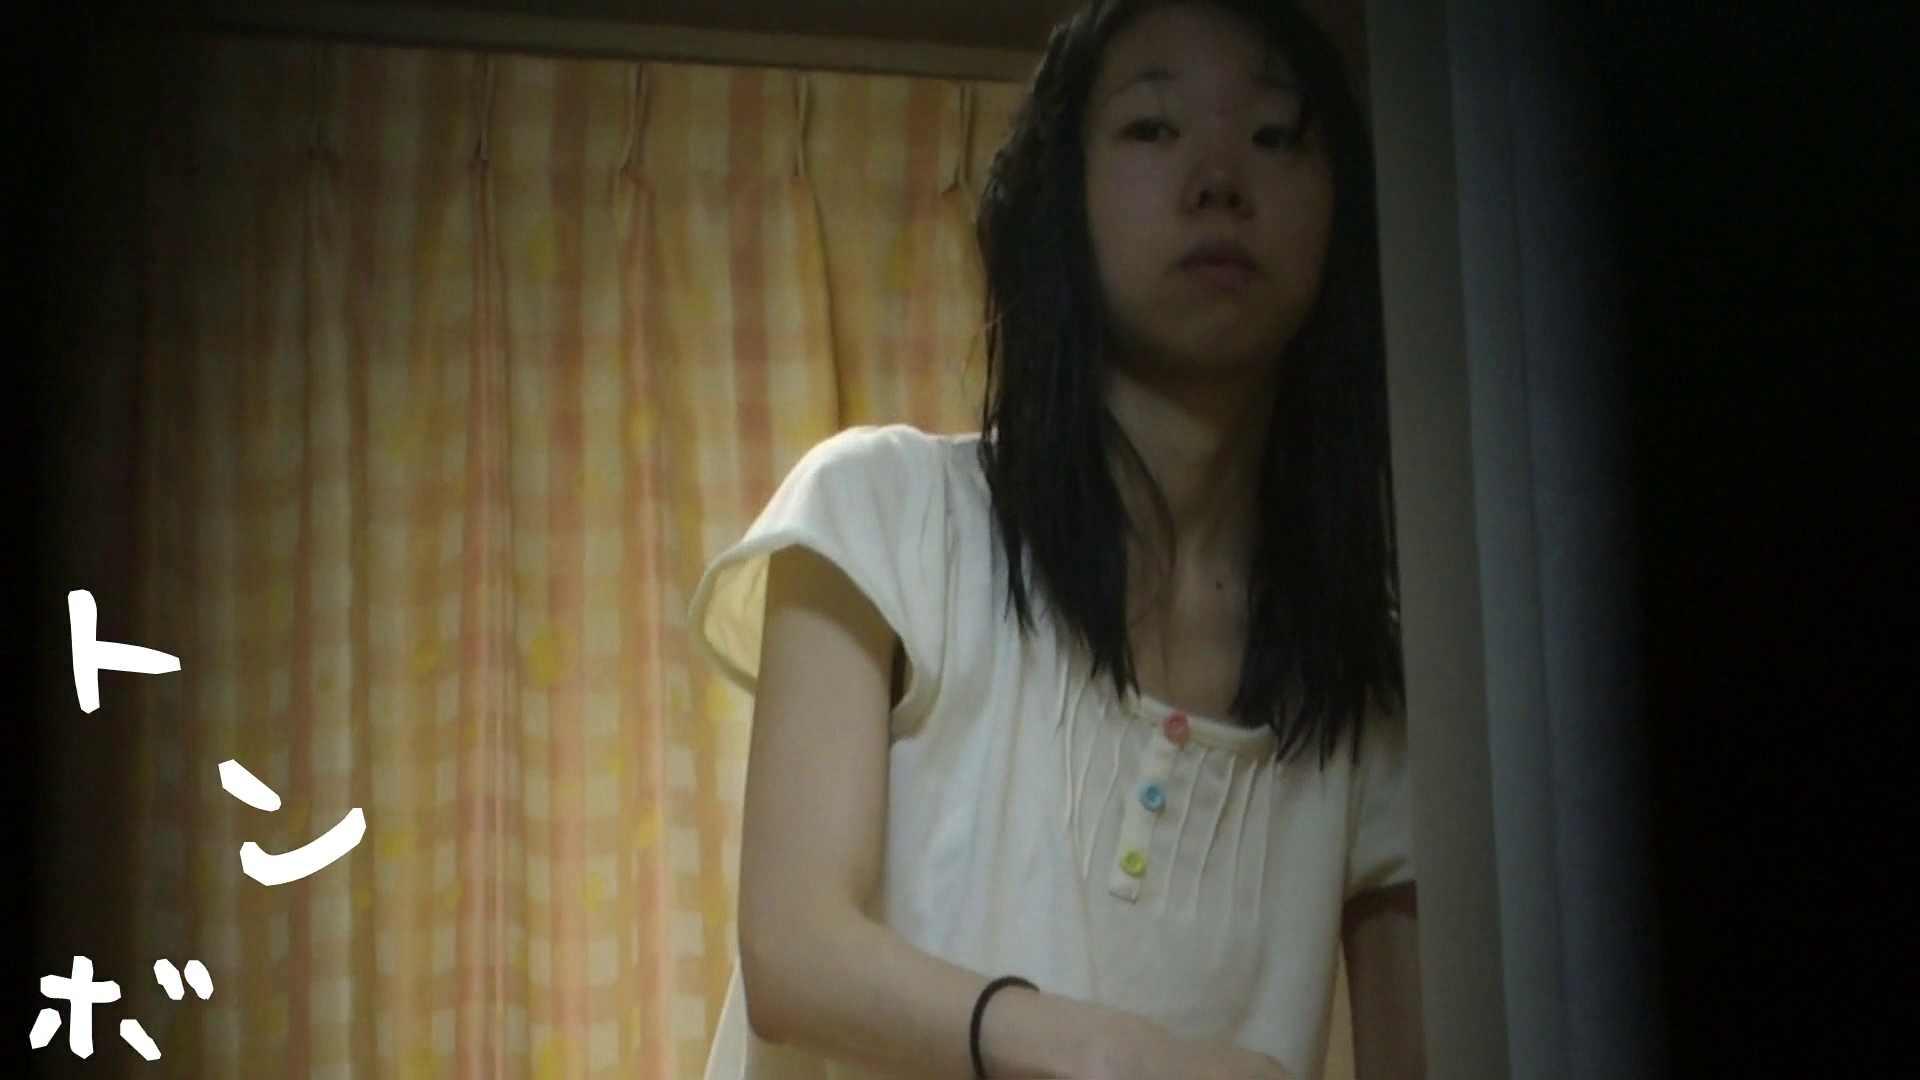 リアル盗撮 現役女子大生の私生活③ 細身  104PIX 26